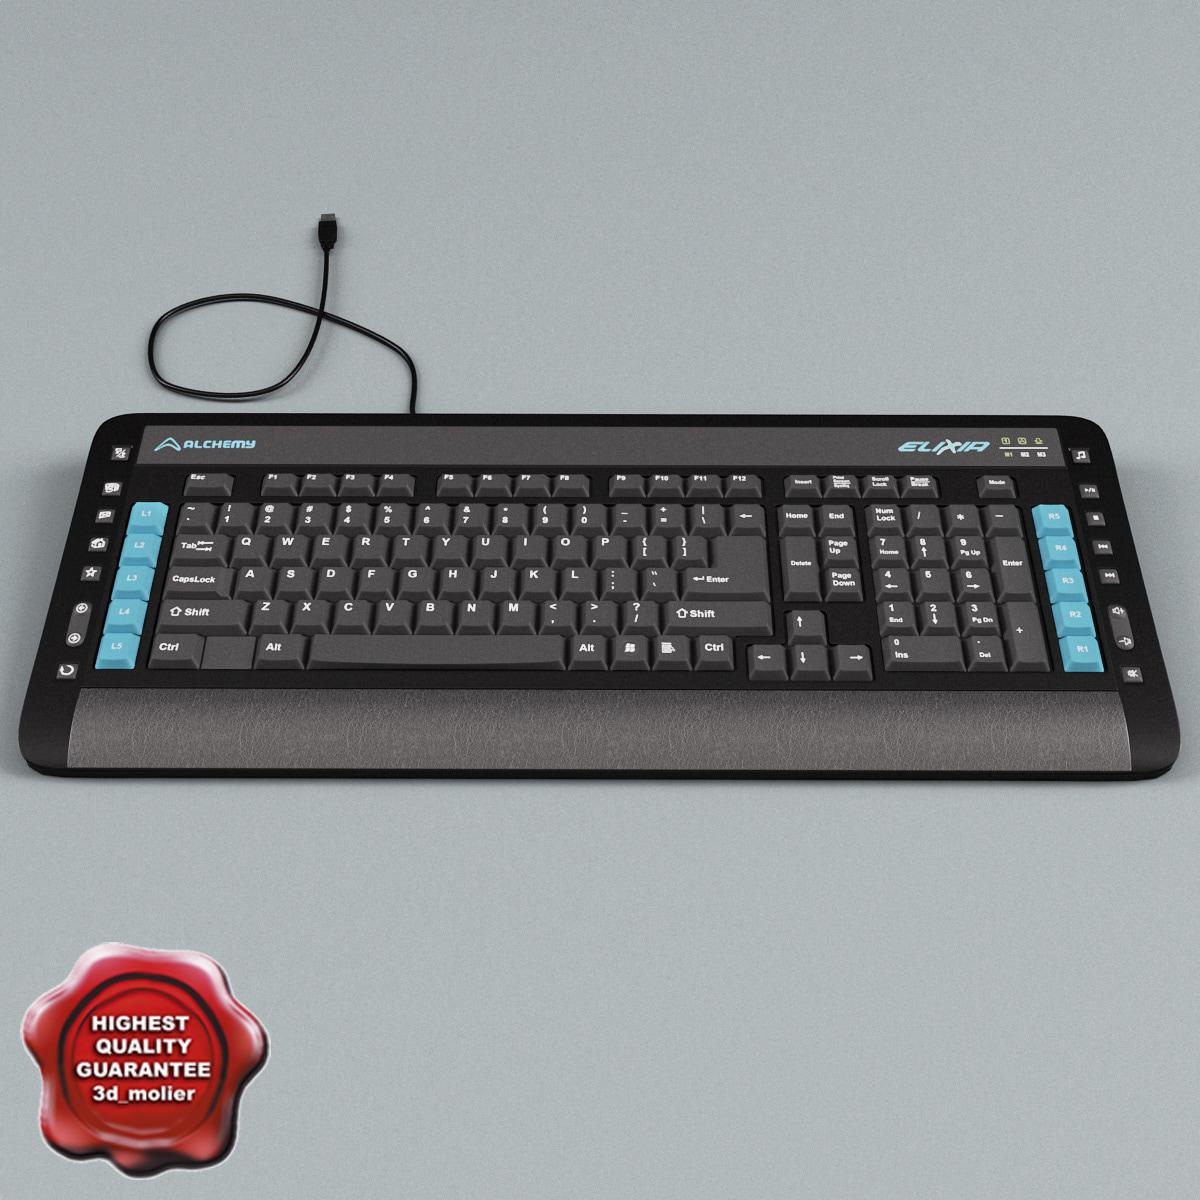 OCZ_Alchemy_Keyboard_00.jpg